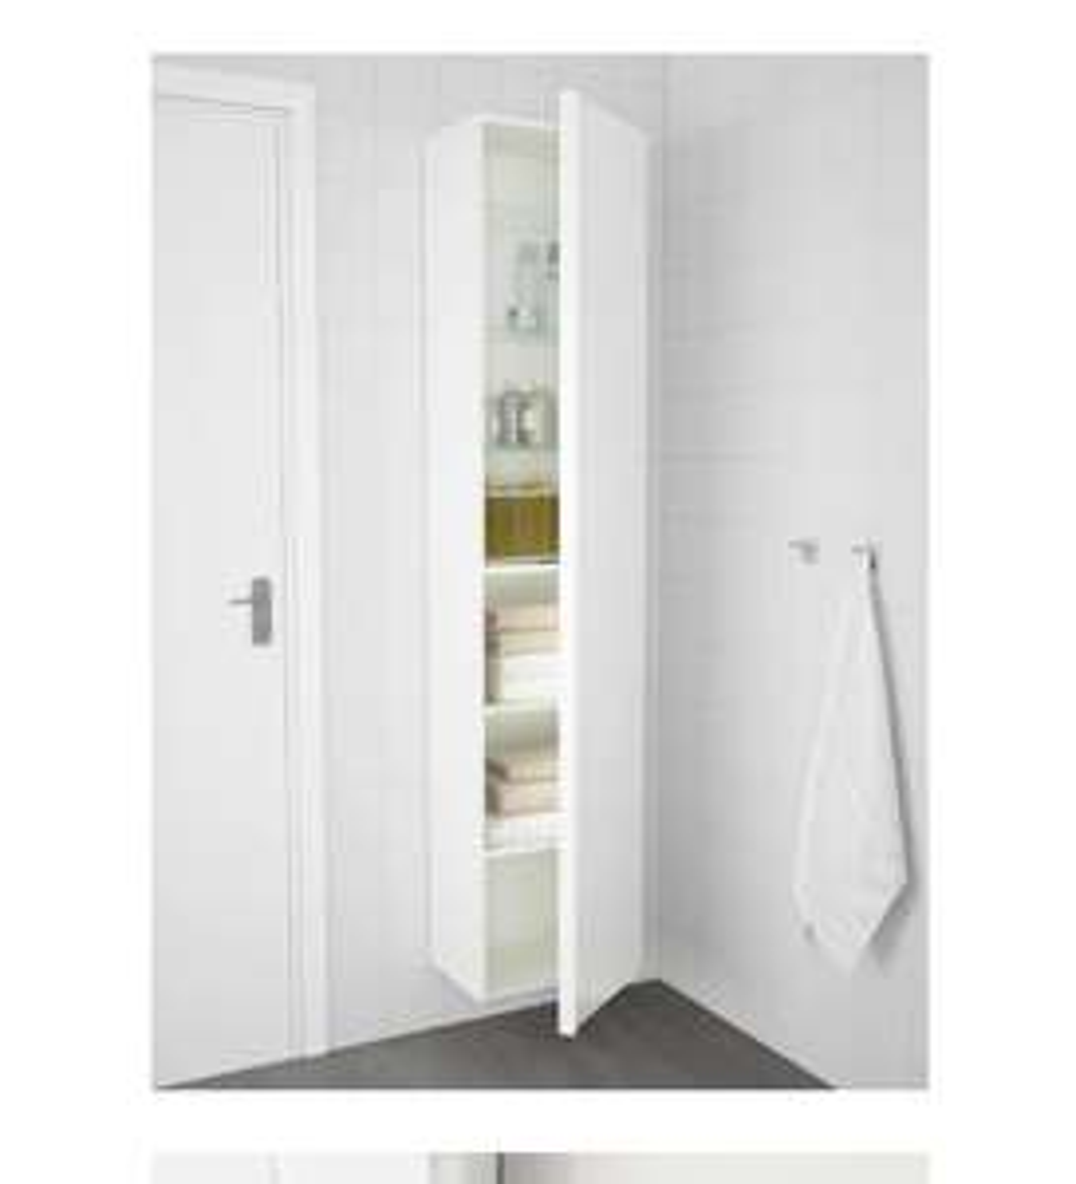 Lokal IKEA Sindelfingen Godmorgon Hochschrank, Hochglanz weiß, 40x32x192 cm